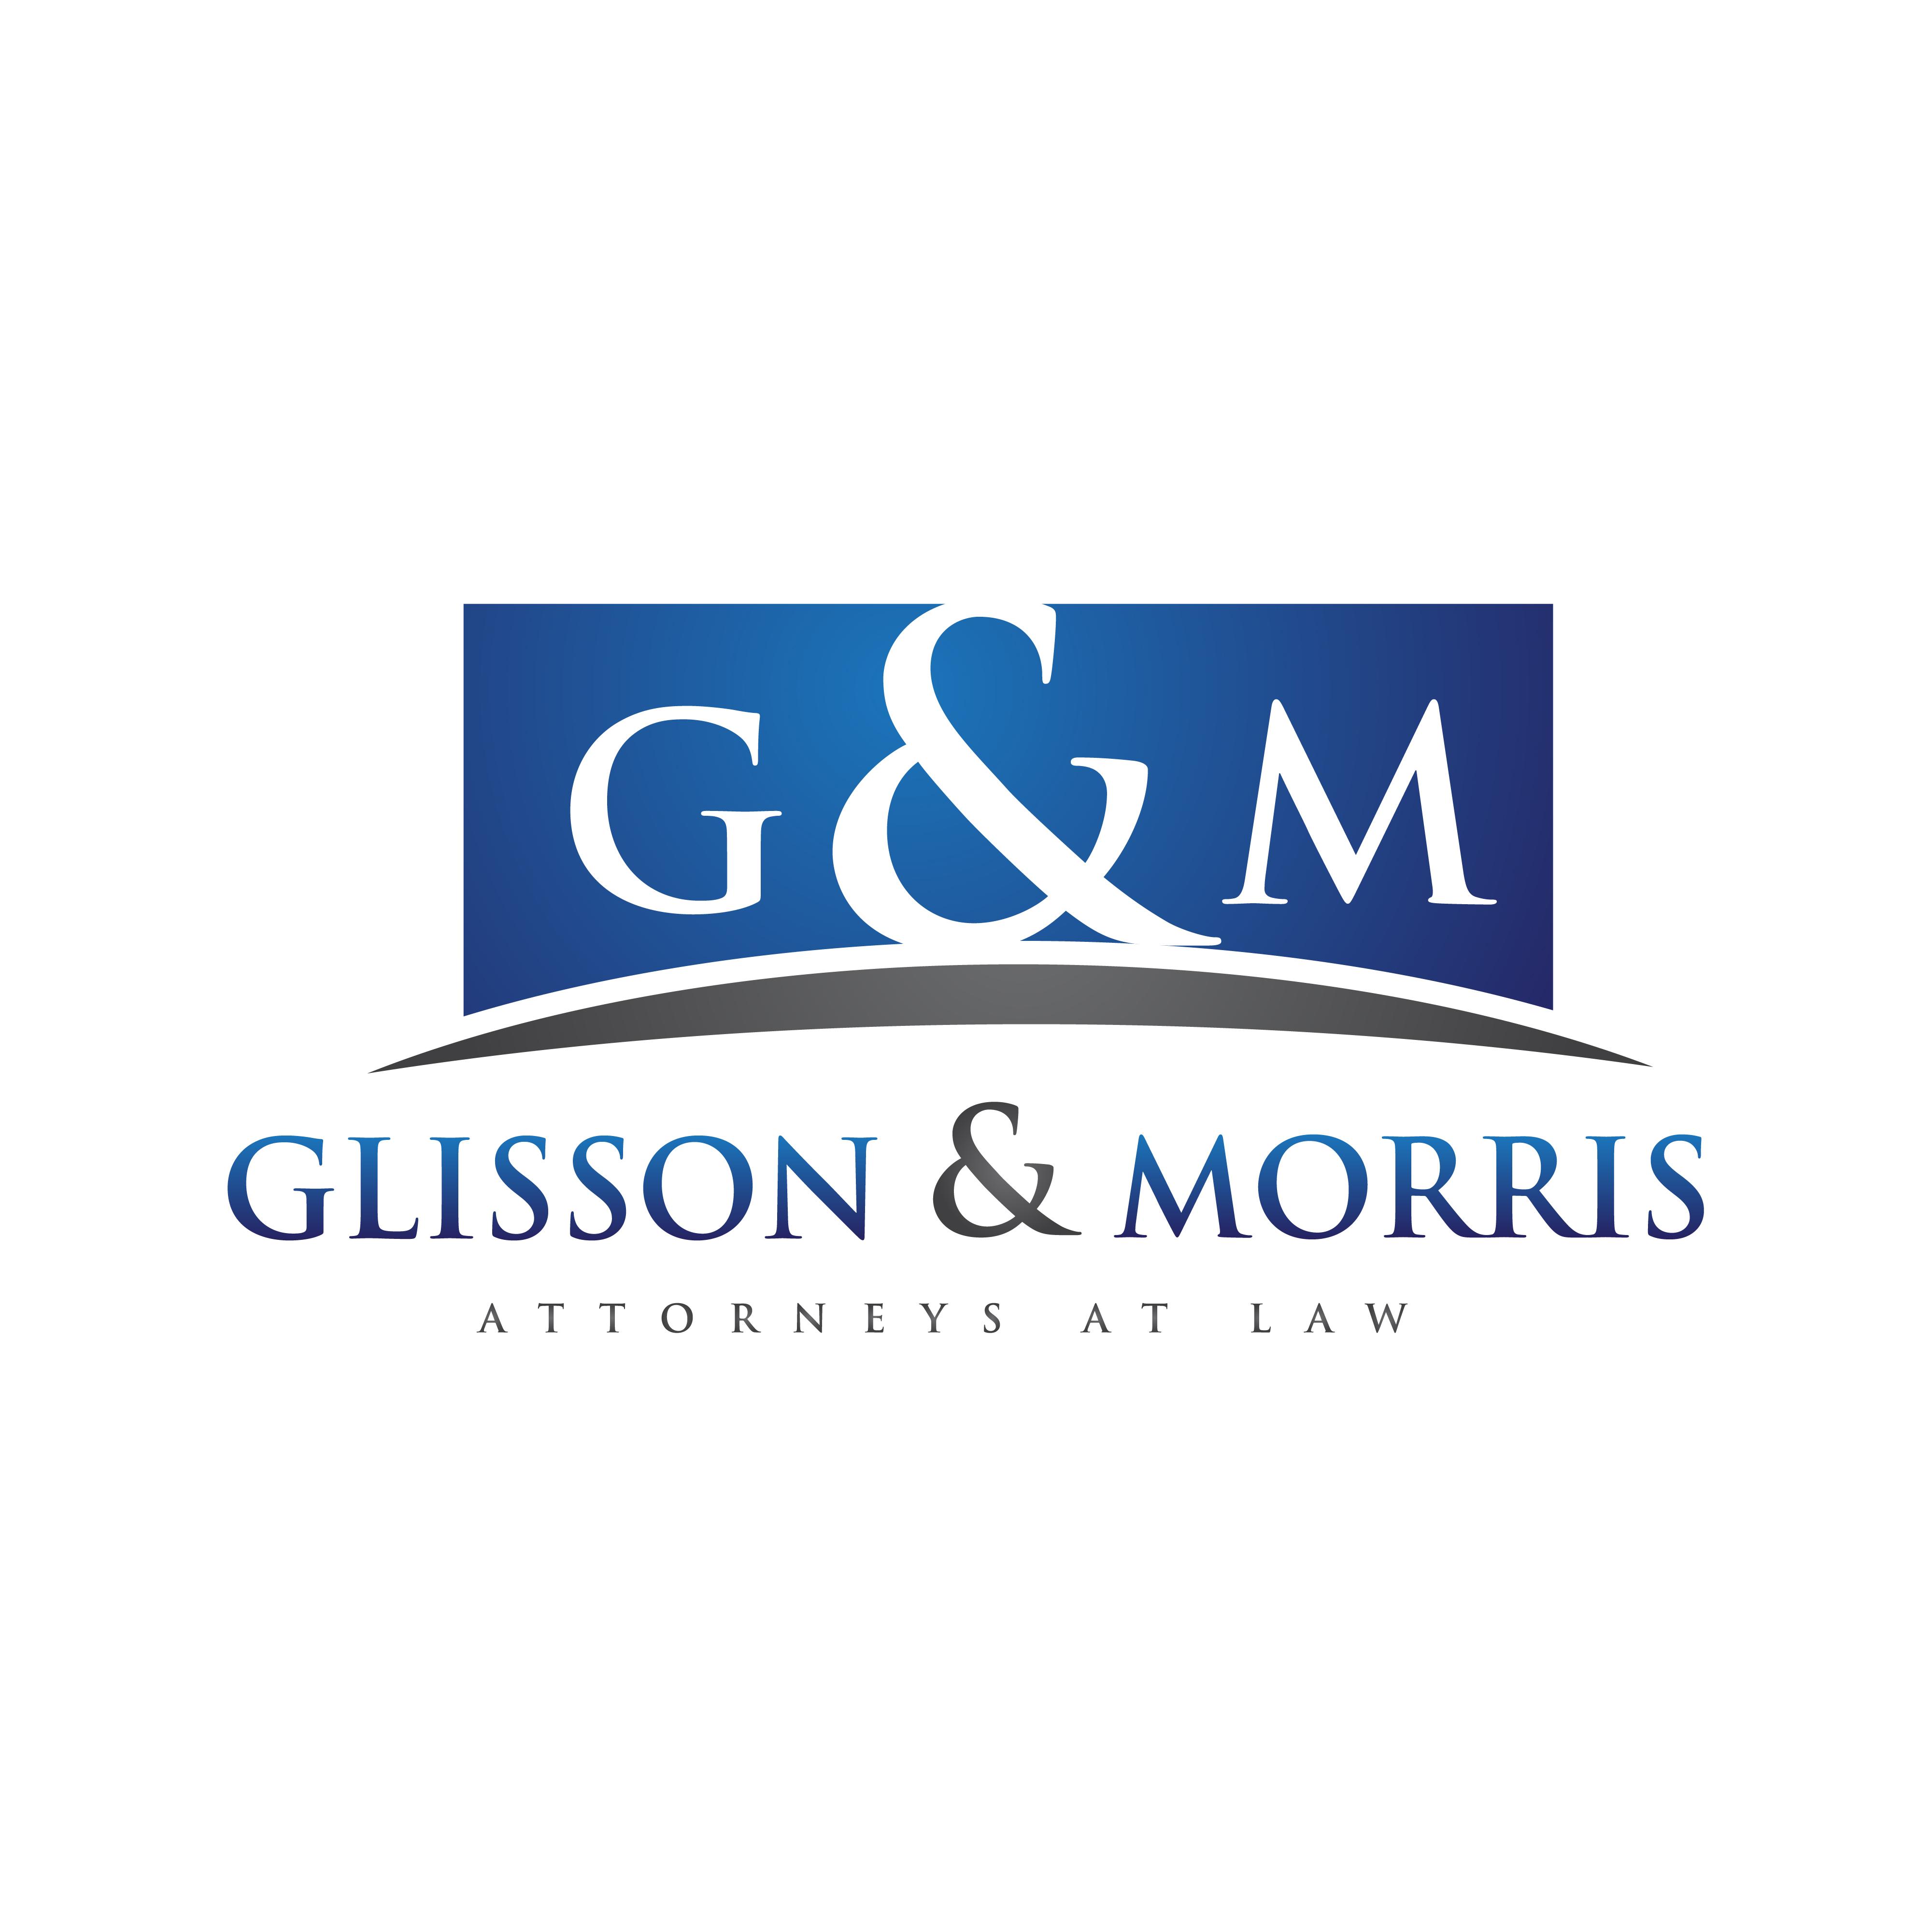 Glisson & Morris Attorneys At Law